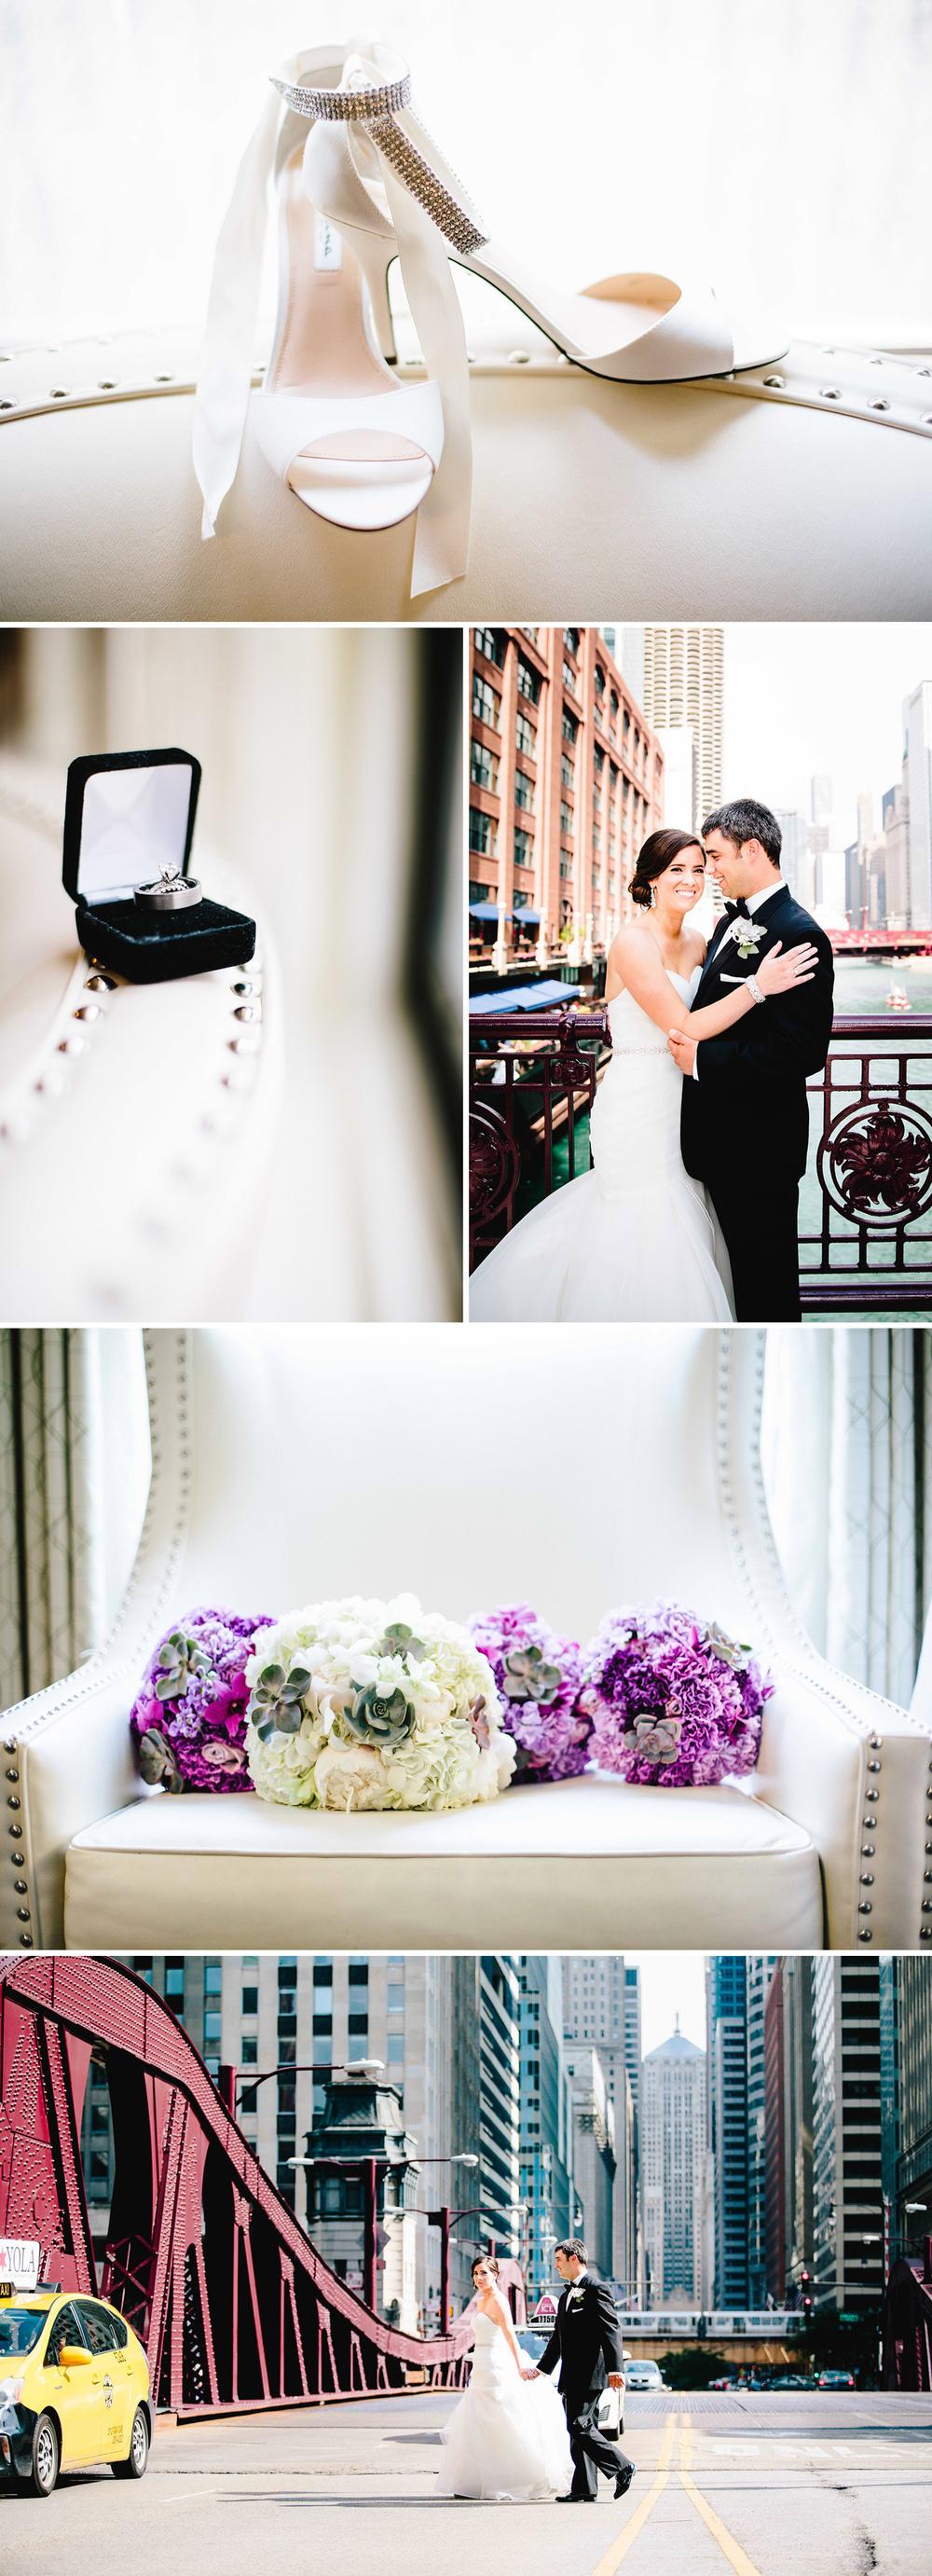 chicago-fine-art-wedding-photography-cassata